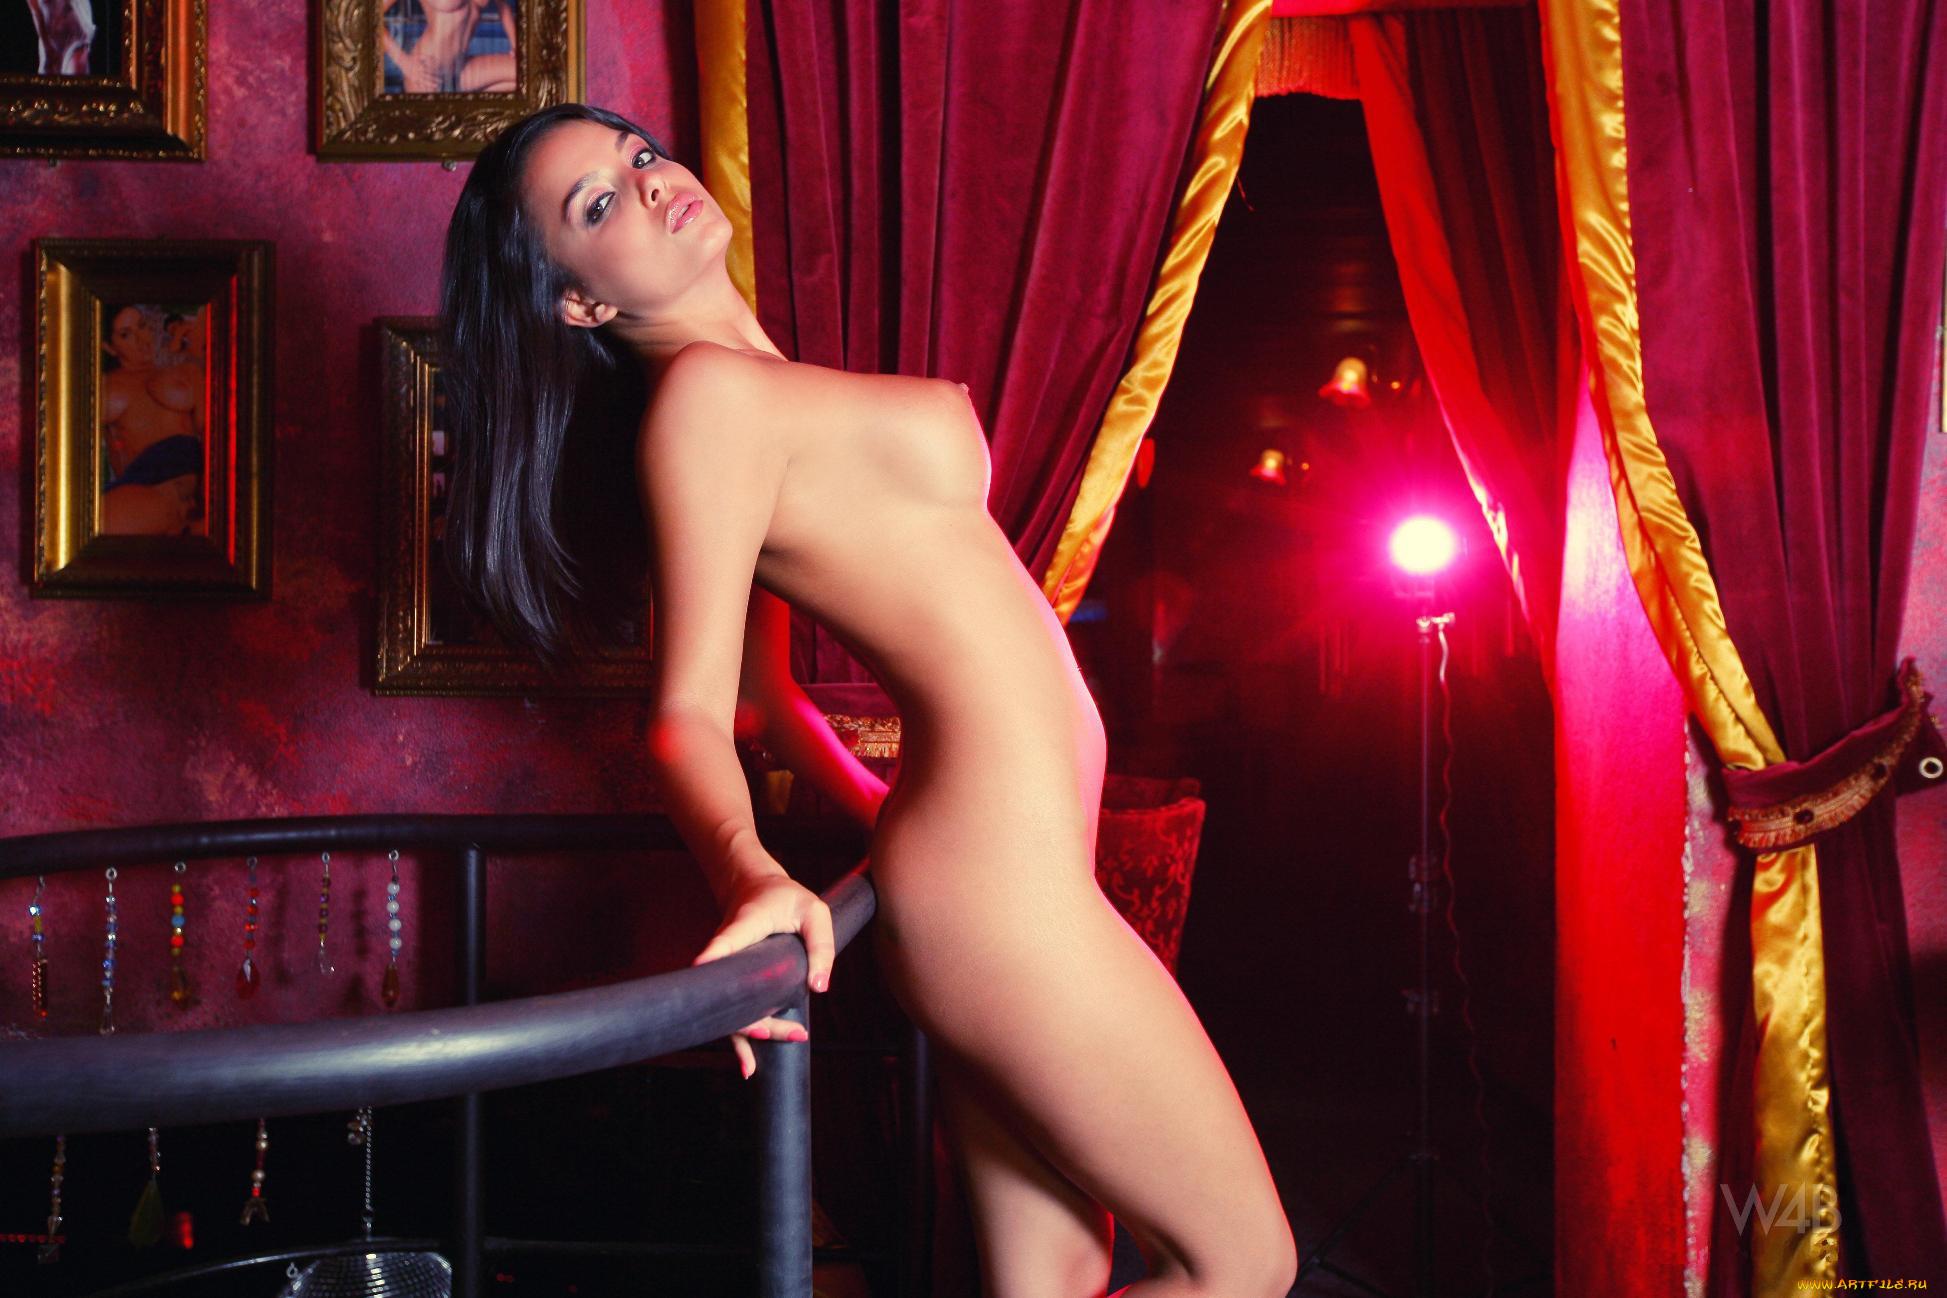 England striptease